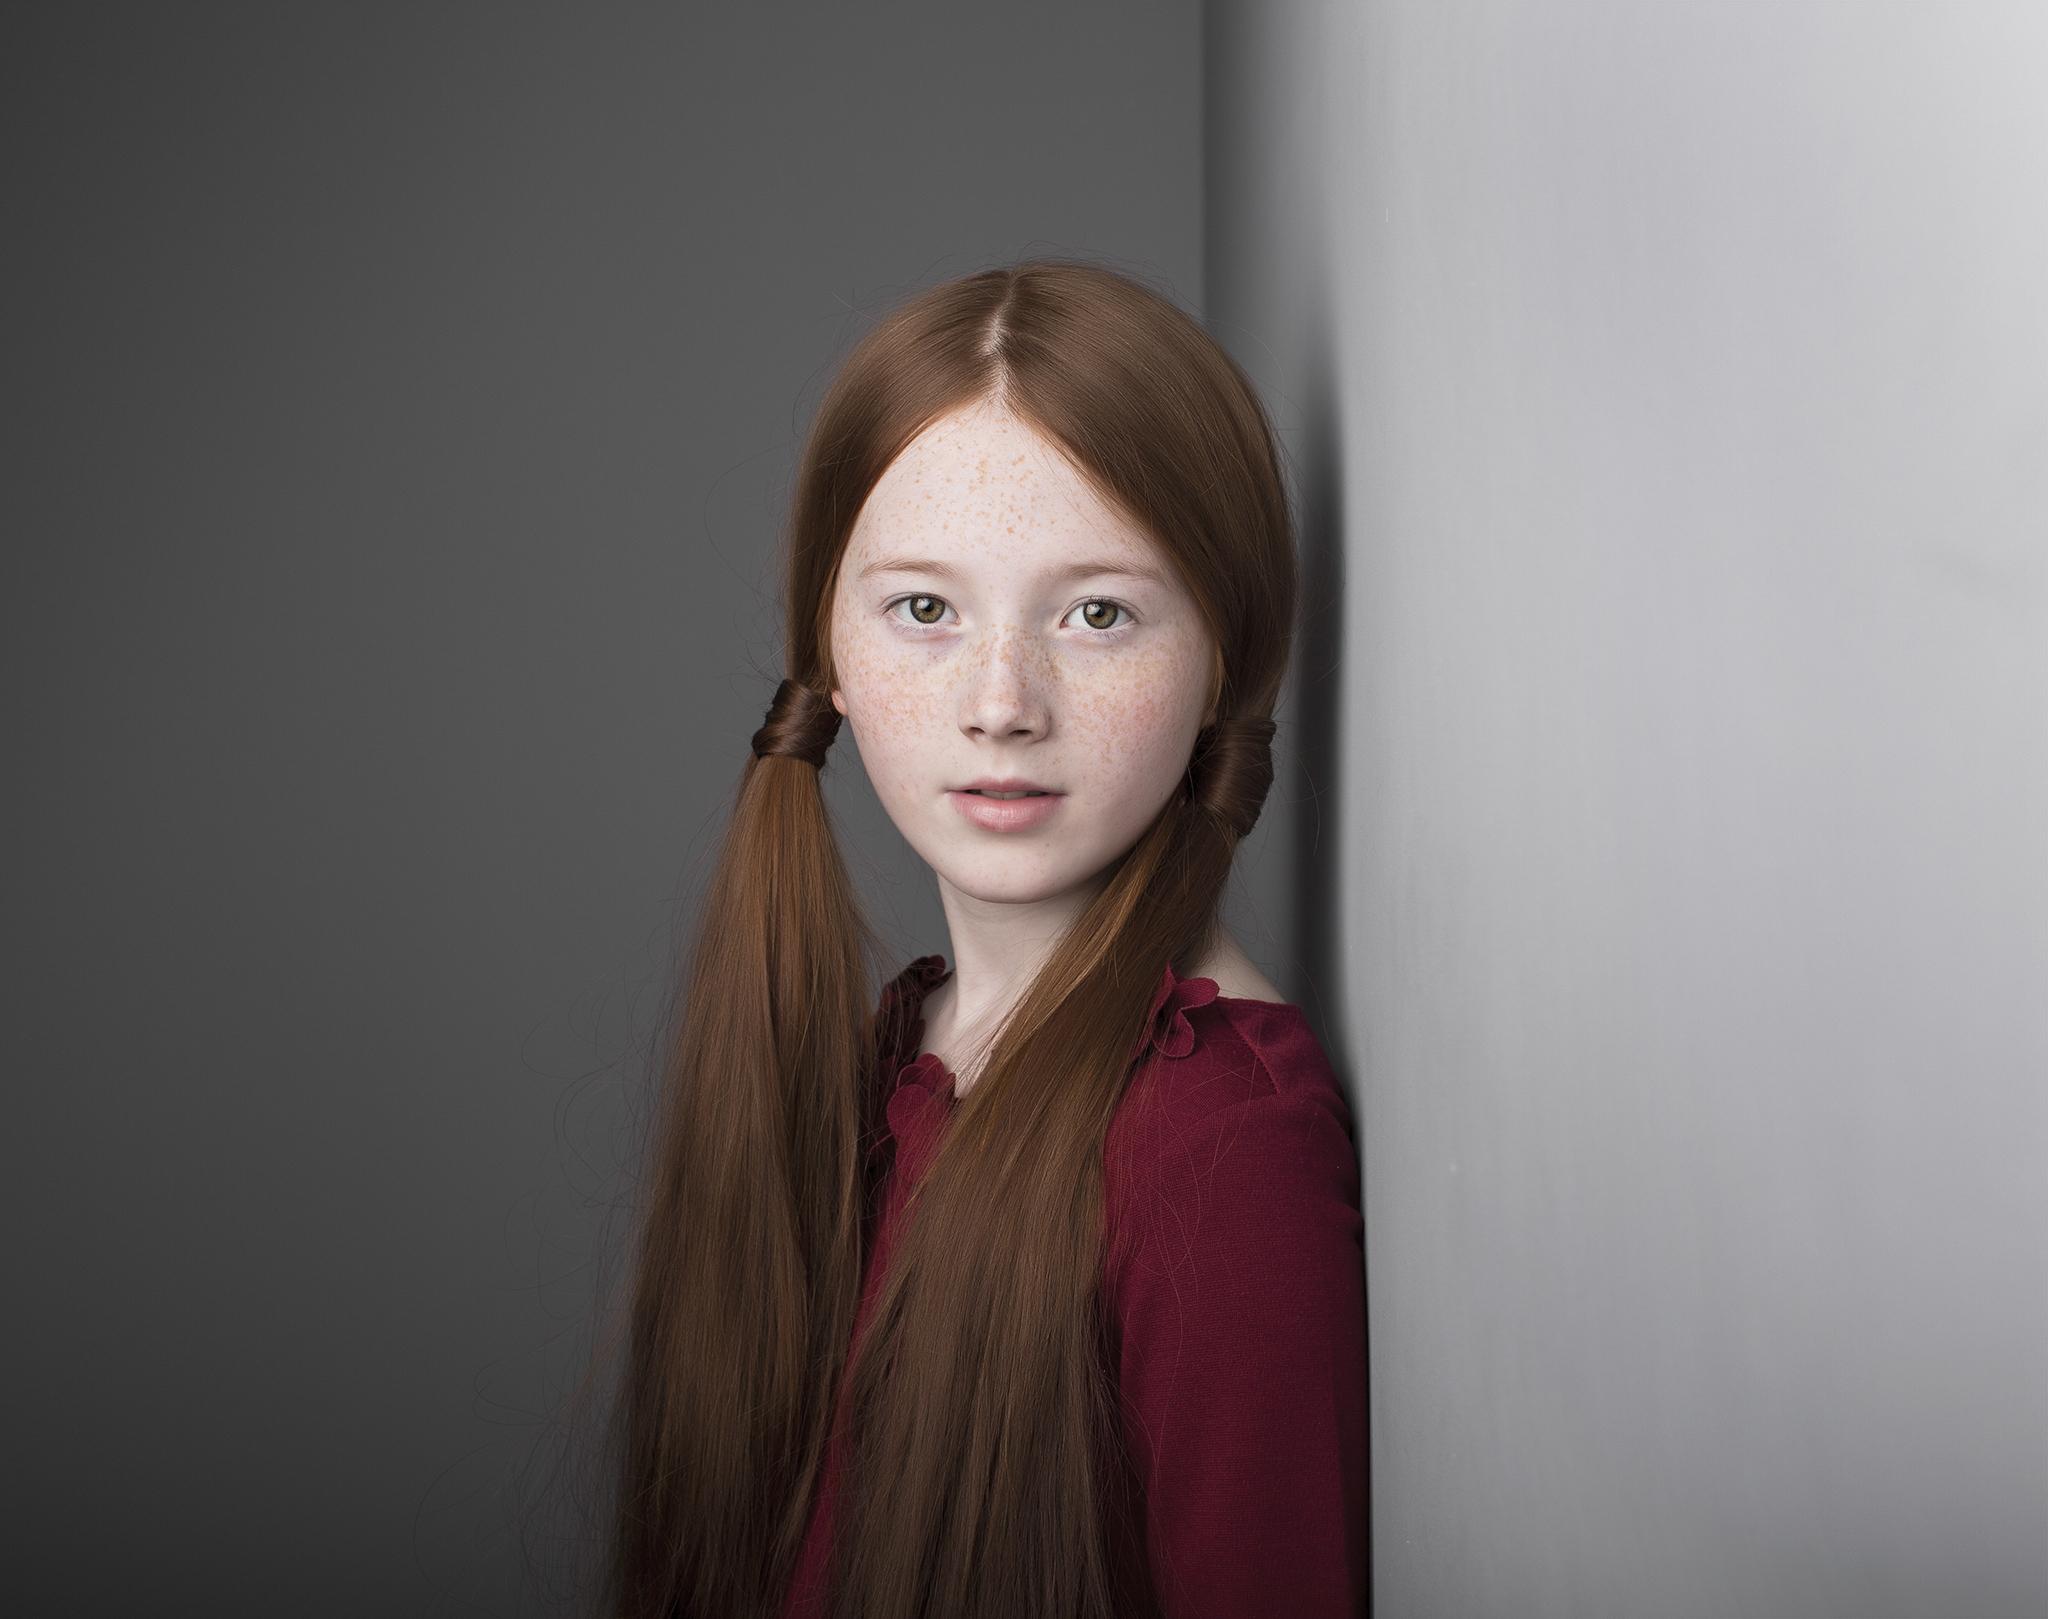 elizabethgphotography_childrens_fineart_kingslangley_hertfordshire_model_lilycave_2.jpg